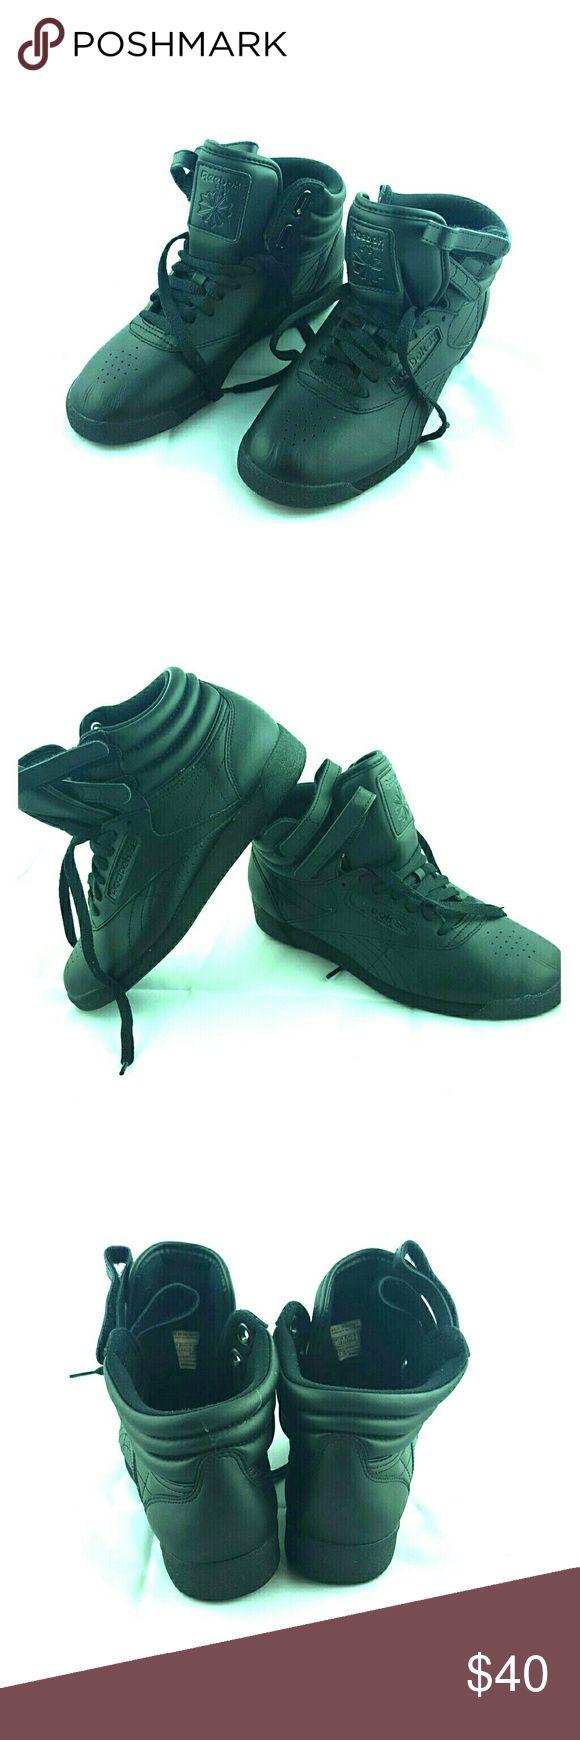 Reebok high top size 7 Pre-own Reebok classic high top women's Size 7 Reebok Shoes Sneakers